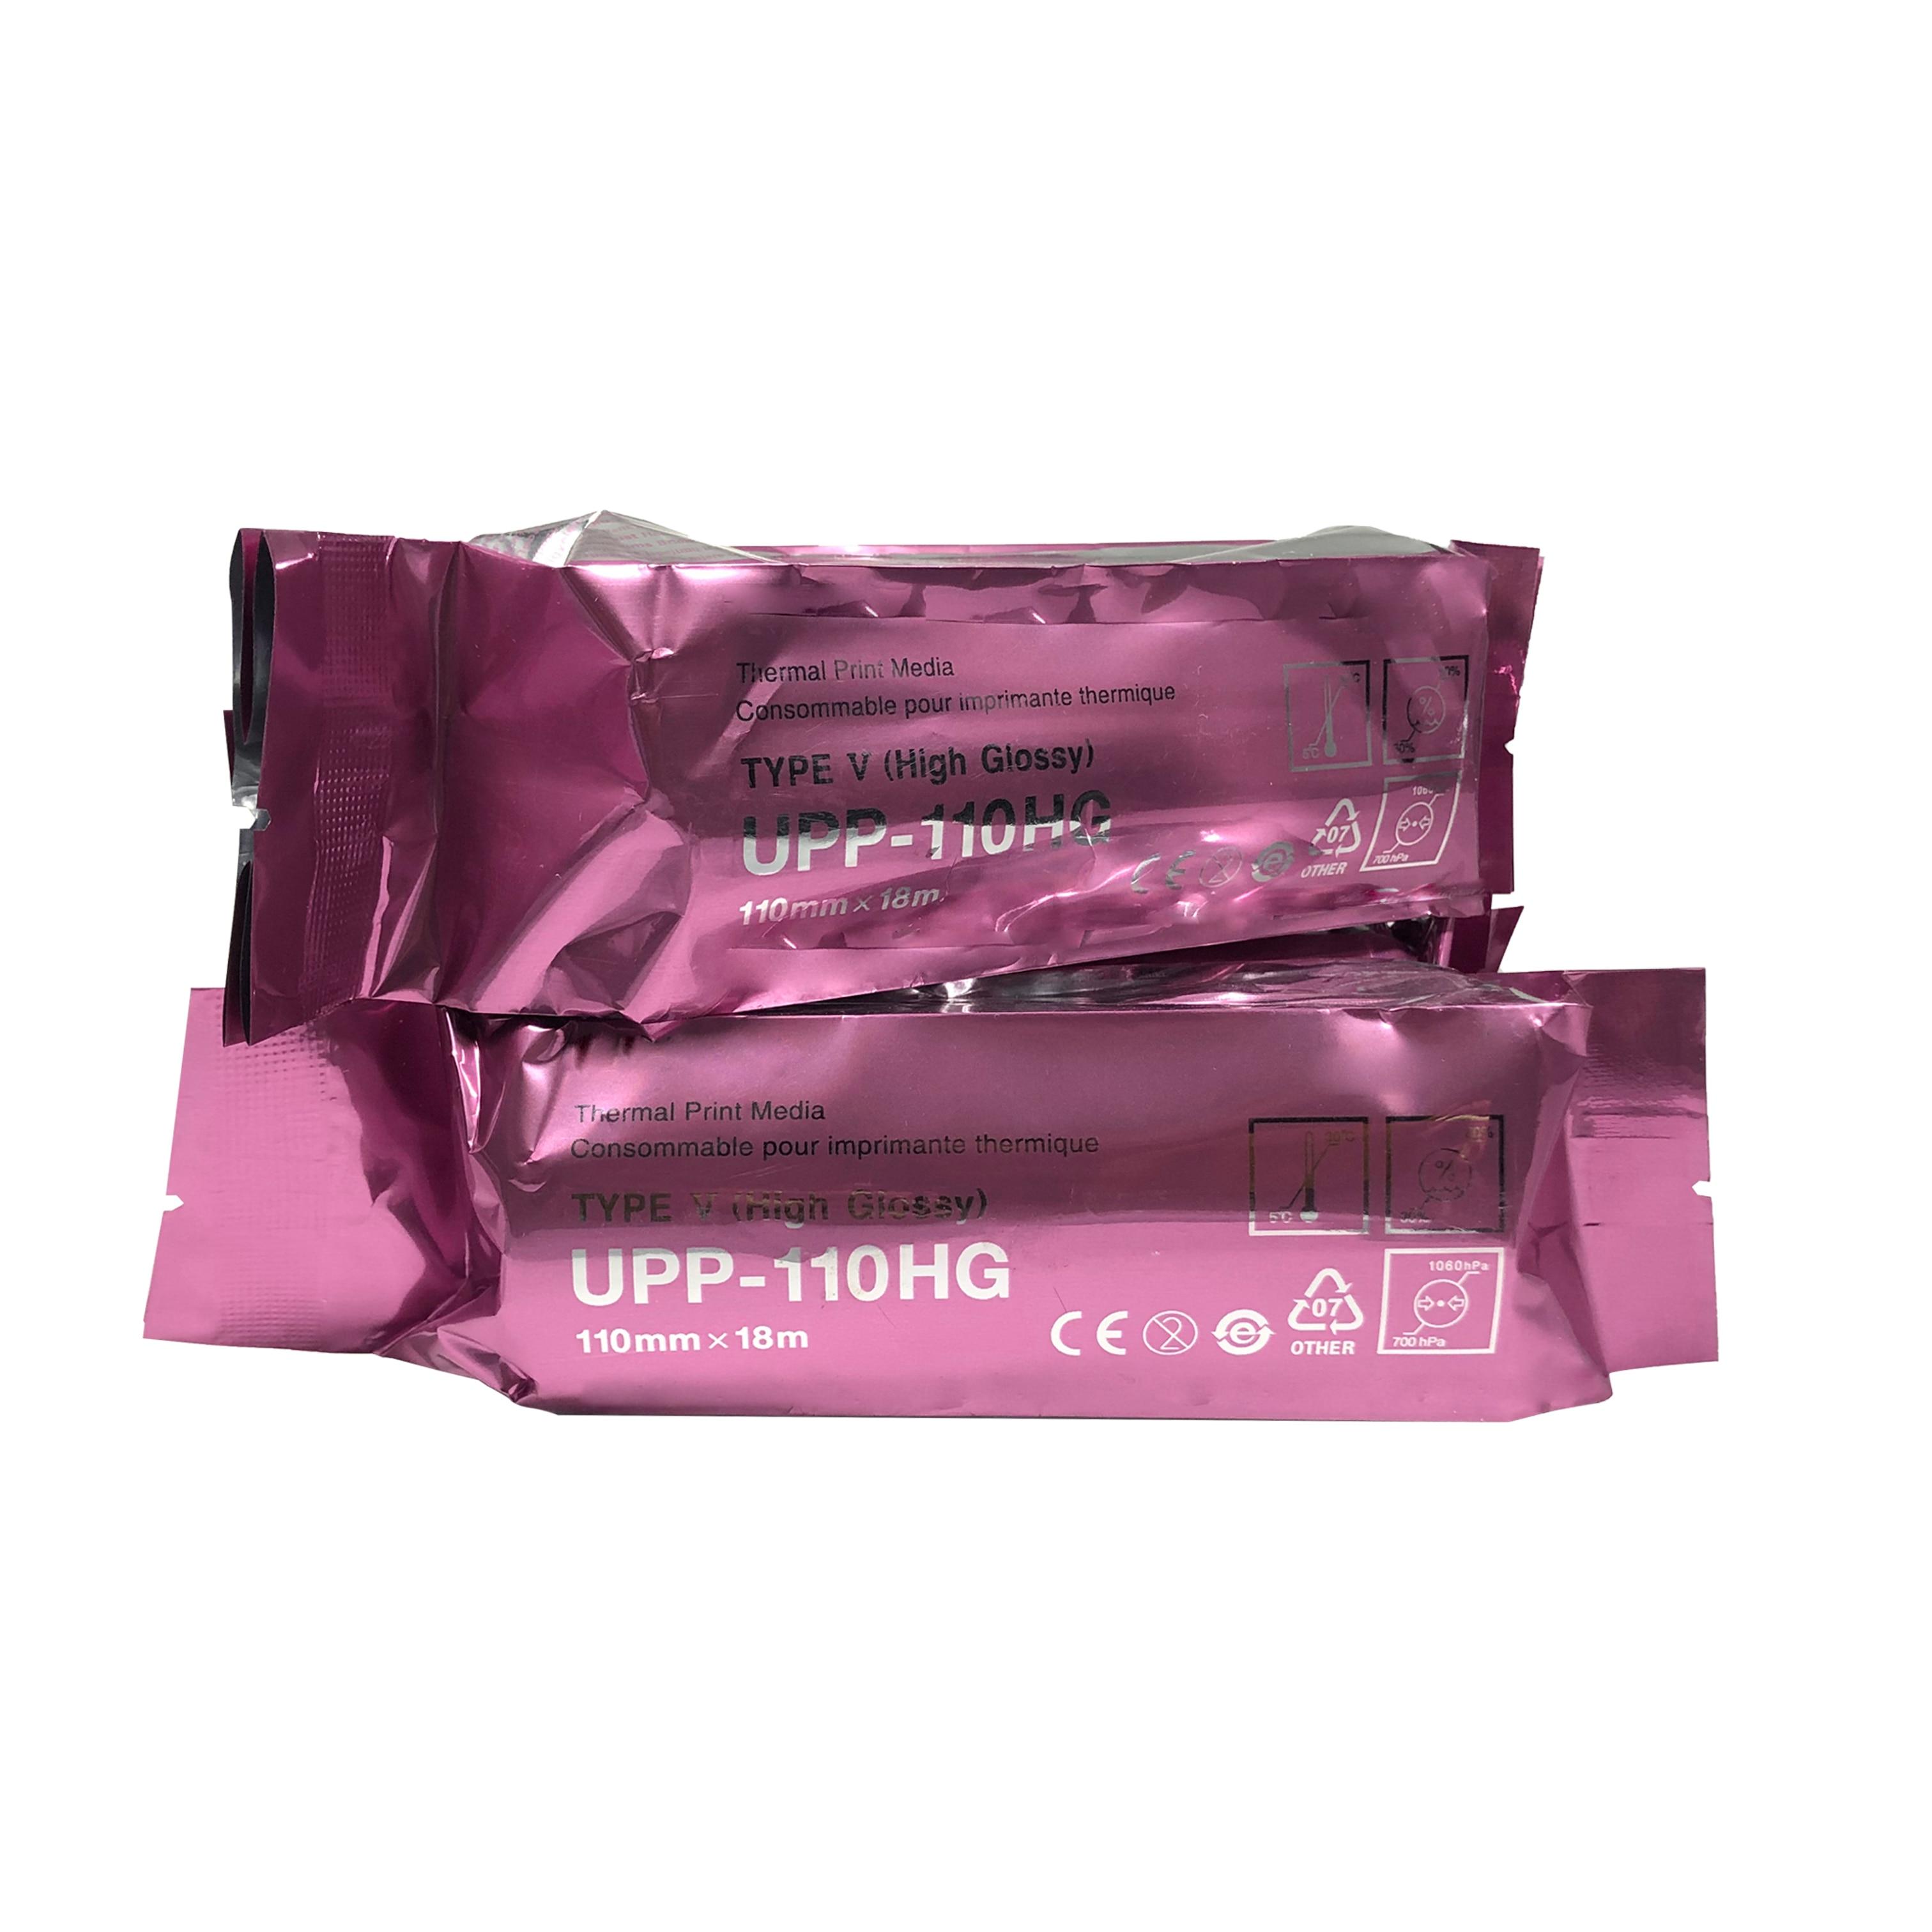 1 Roll UPP-110HG (UPP-110S) ultrasound thermal paper roll for sony printer